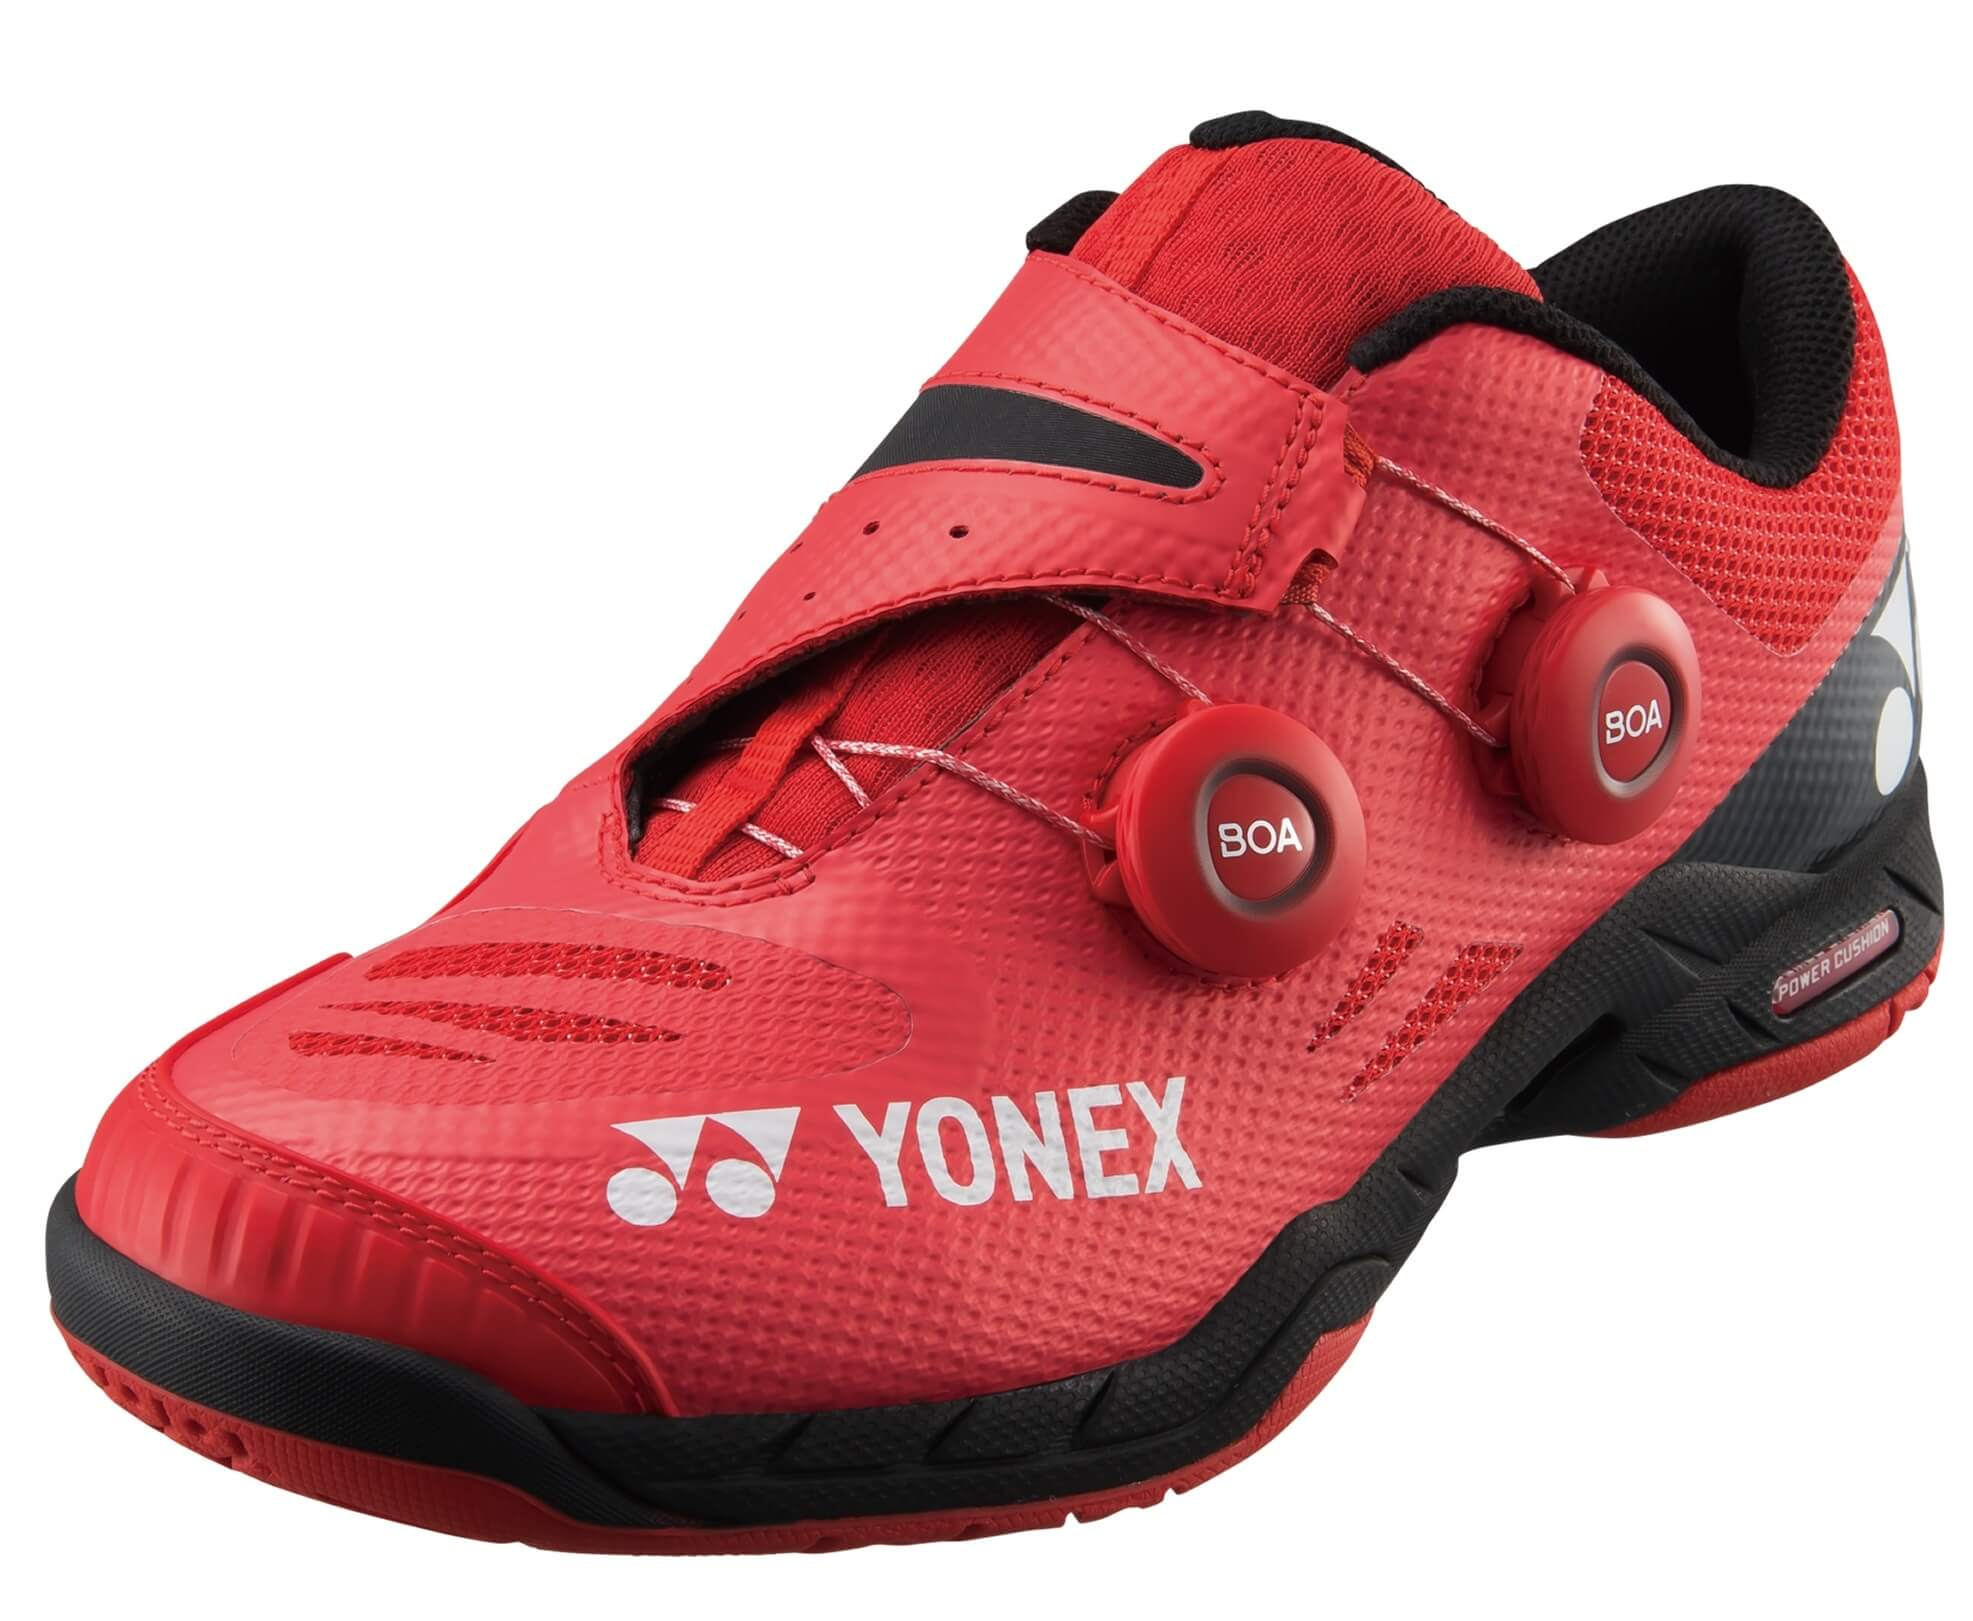 Yonex Infinity Badminton Shoes @ Lowest